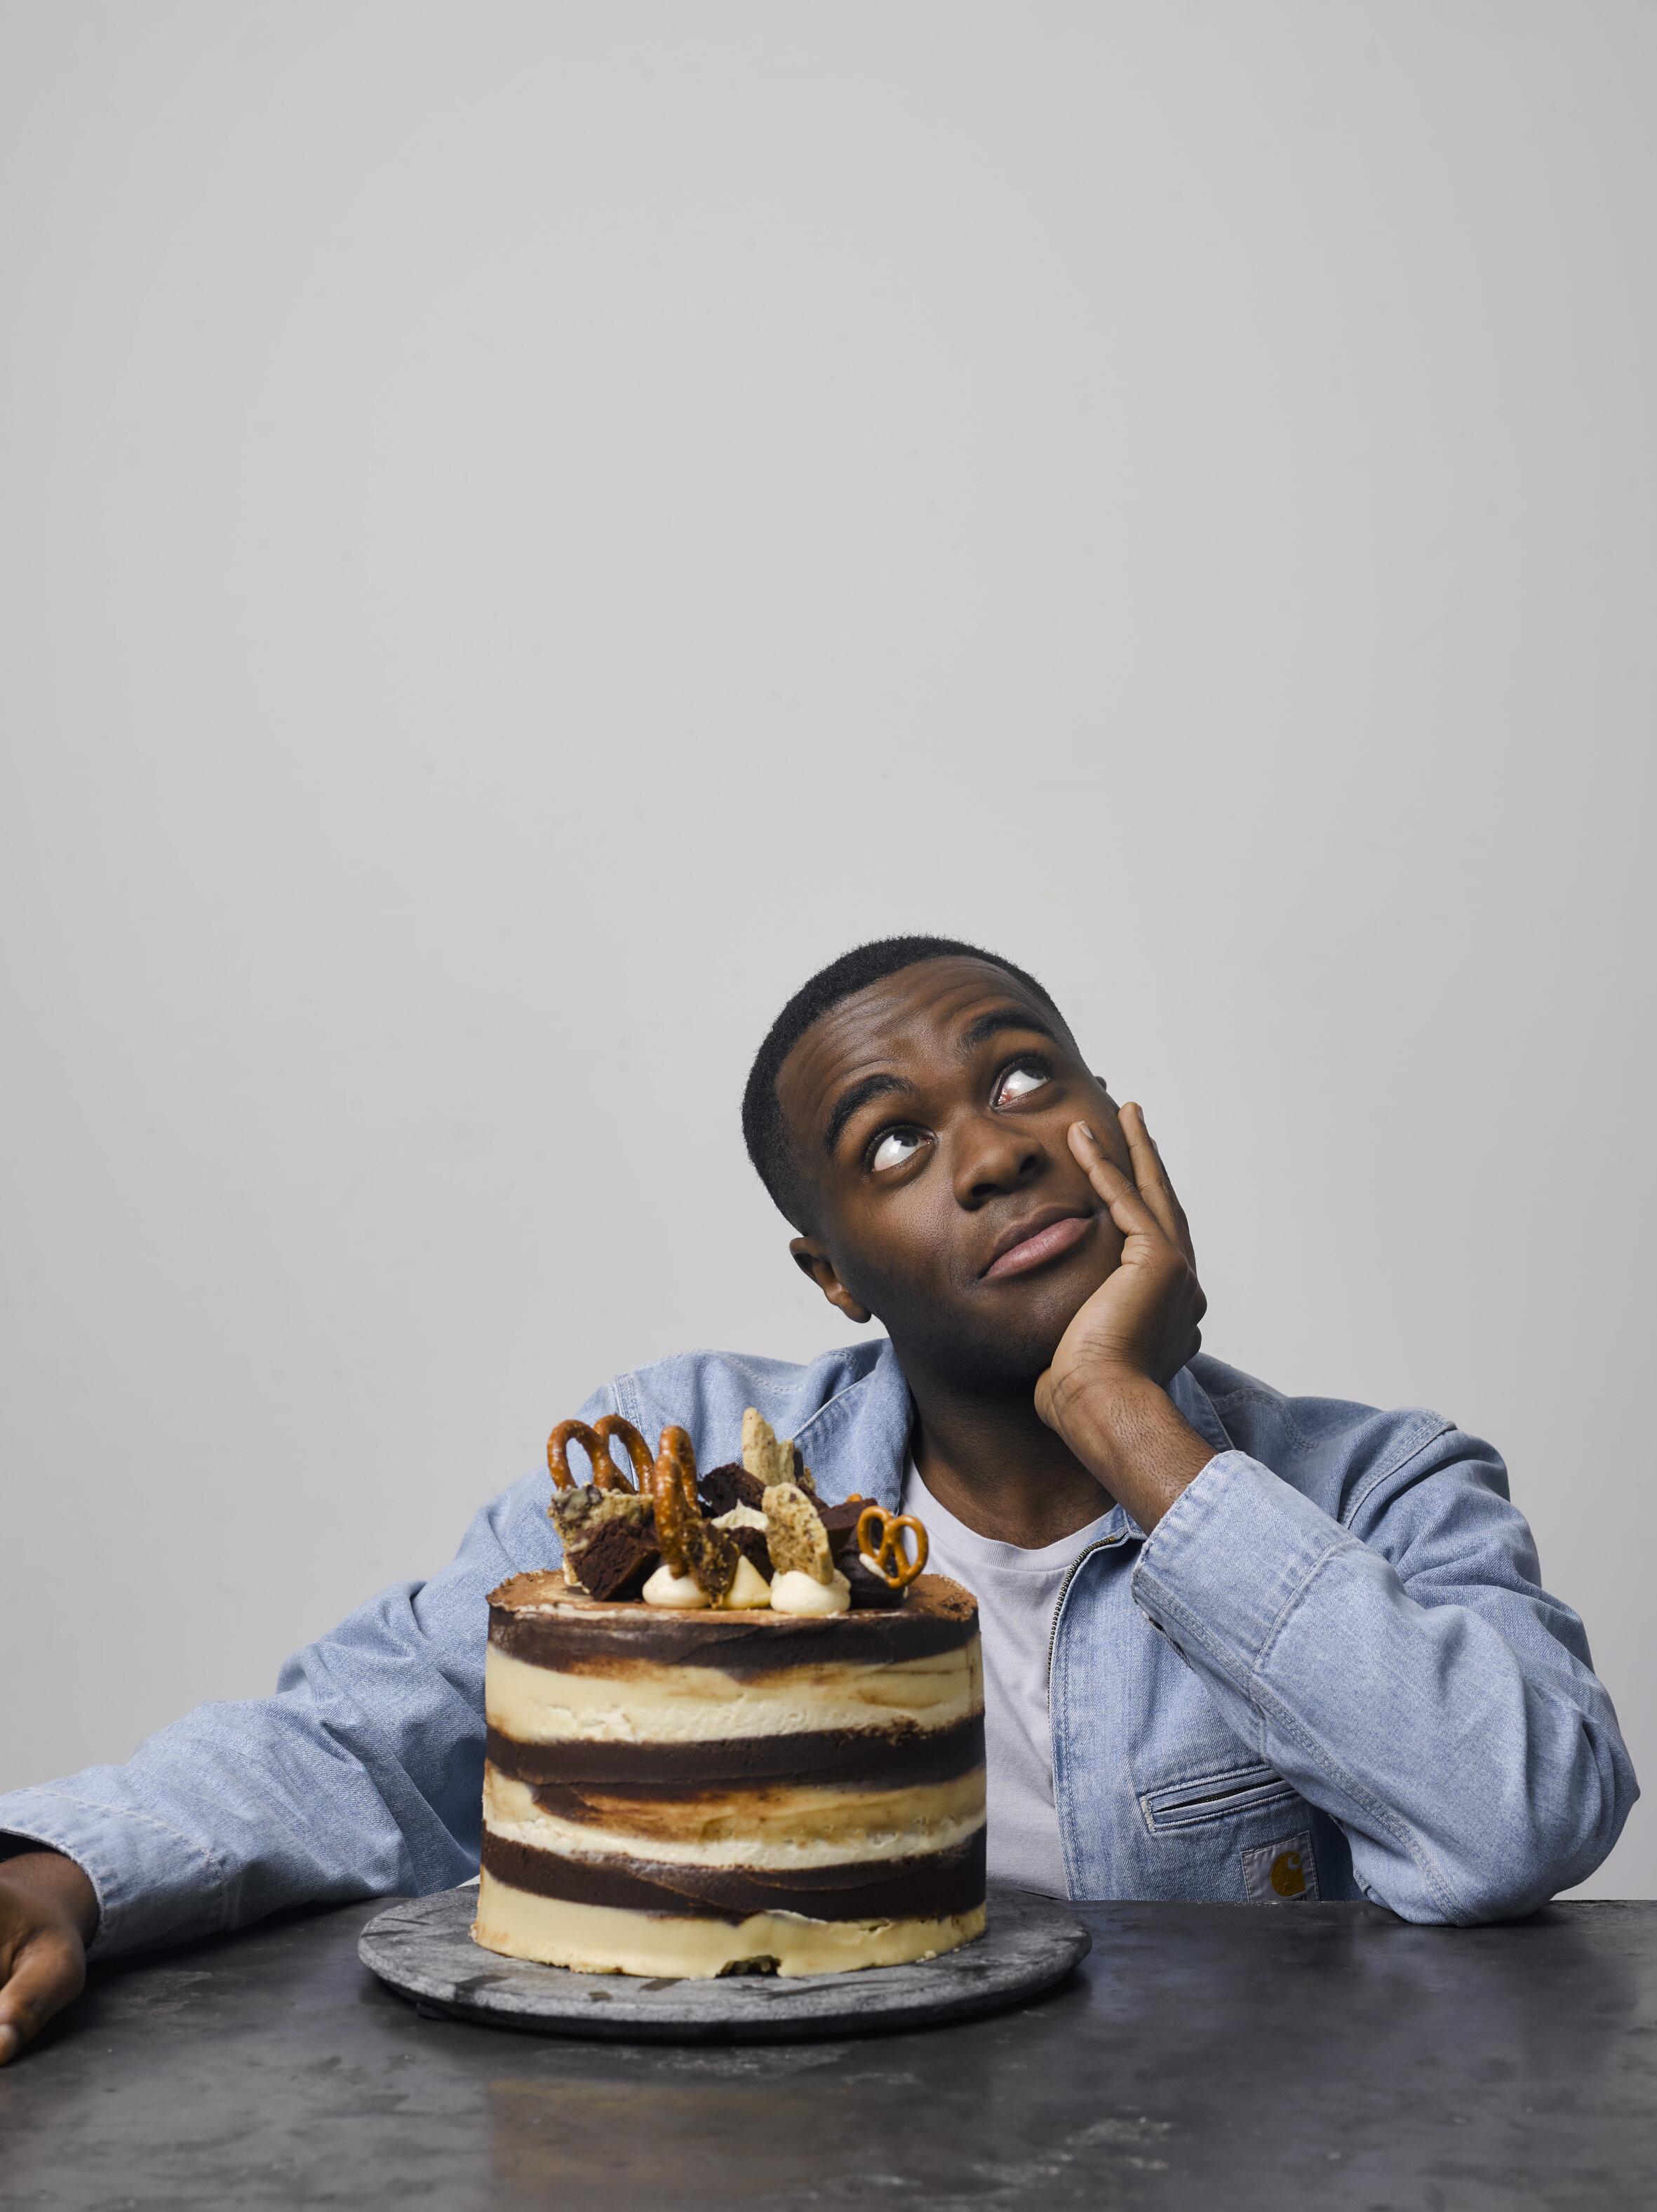 HH Cake Boy DAy 9 Liam Cover 001.jpg